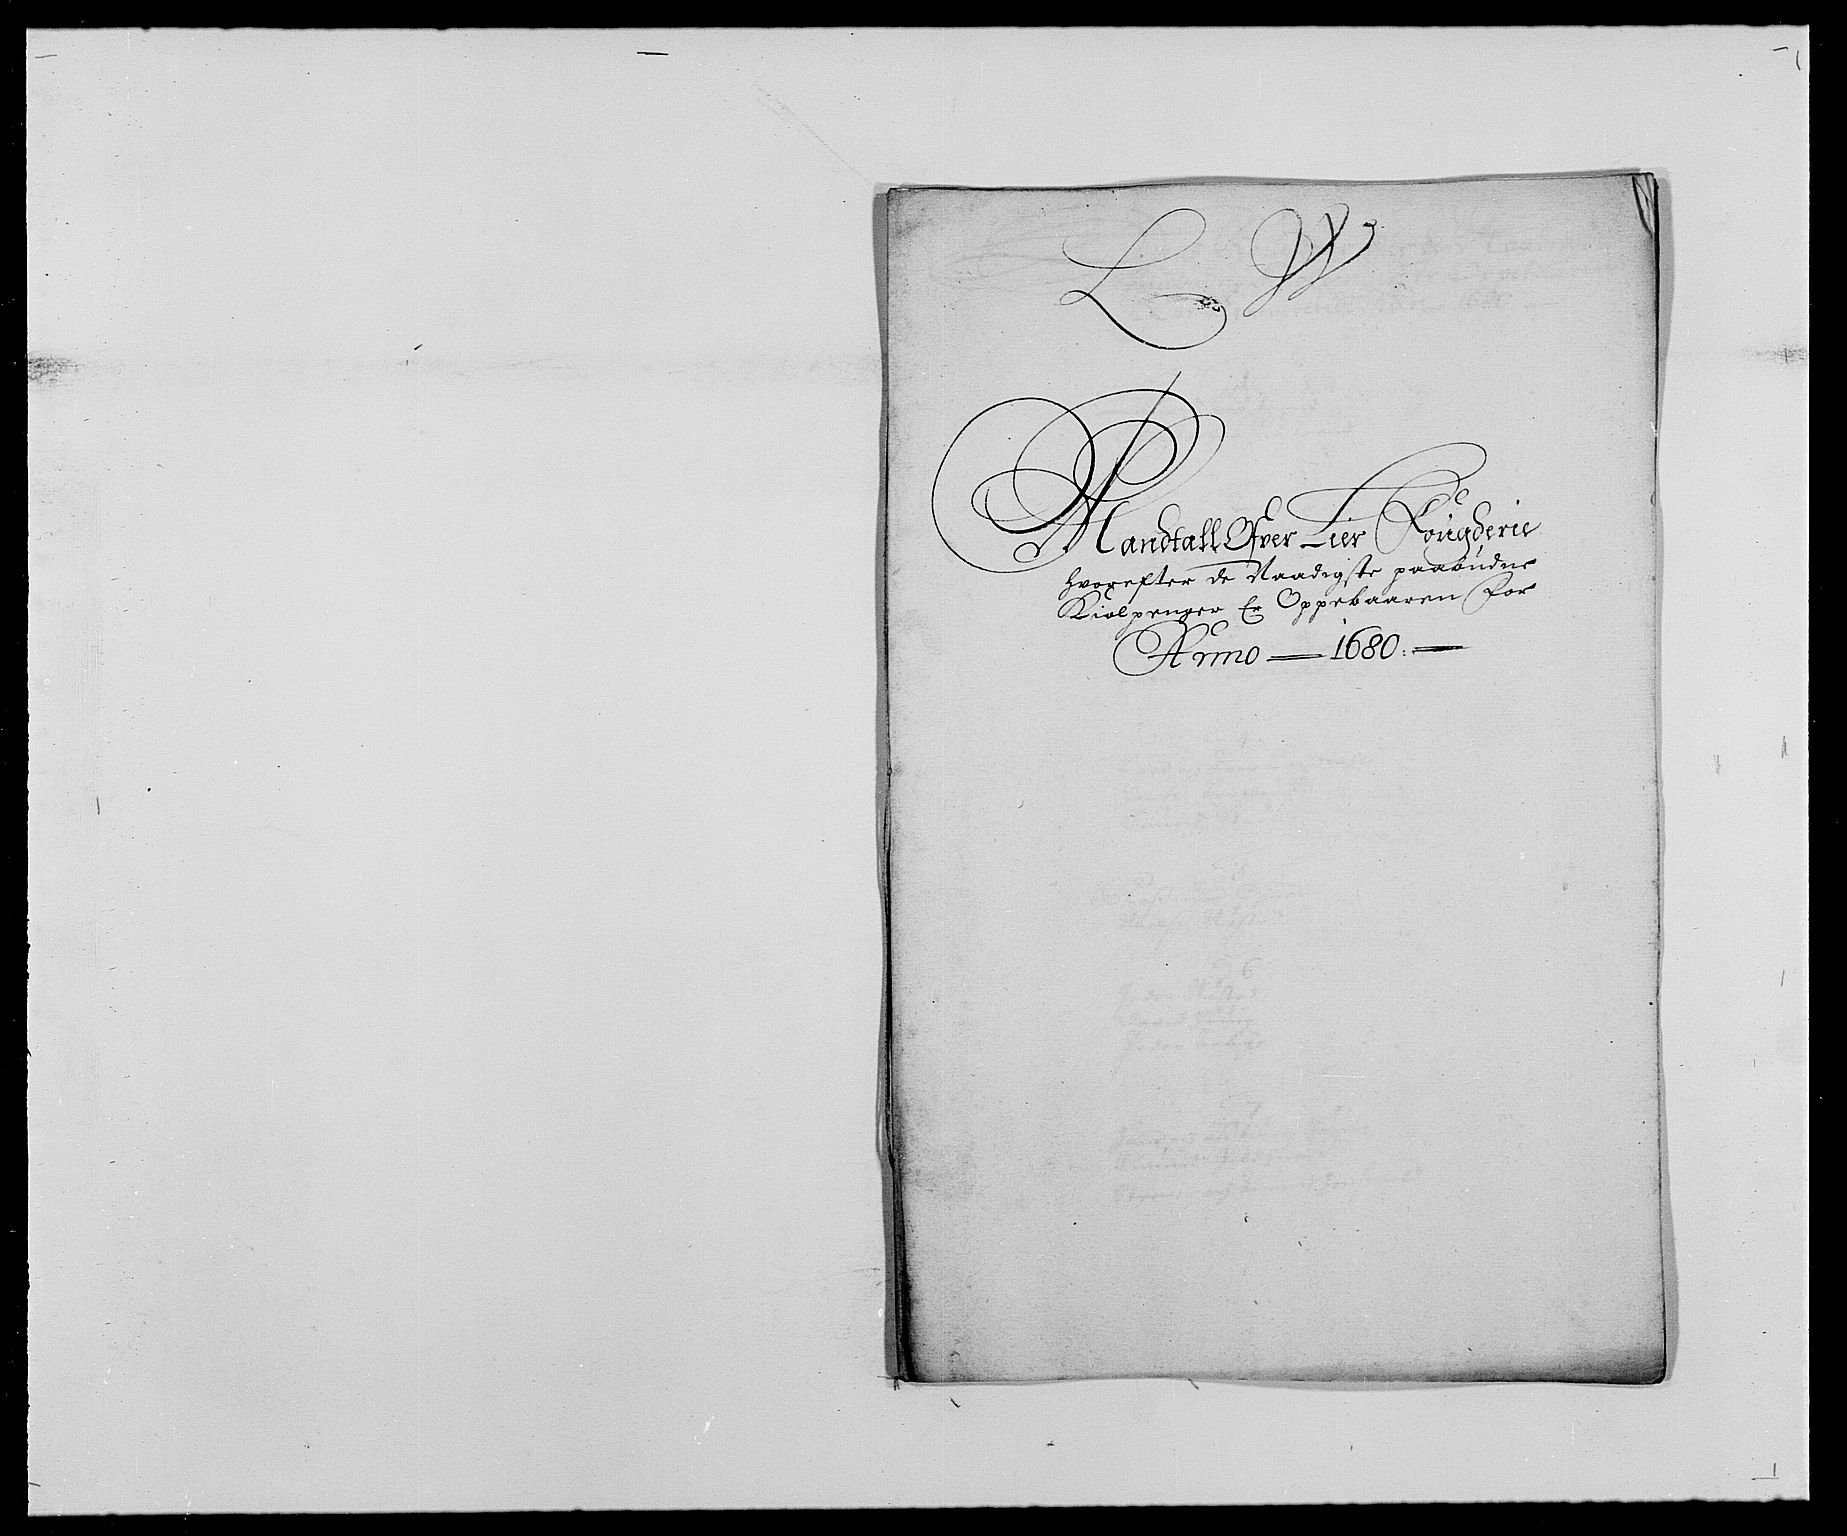 RA, Rentekammeret inntil 1814, Reviderte regnskaper, Fogderegnskap, R27/L1686: Fogderegnskap Lier, 1678-1686, s. 277